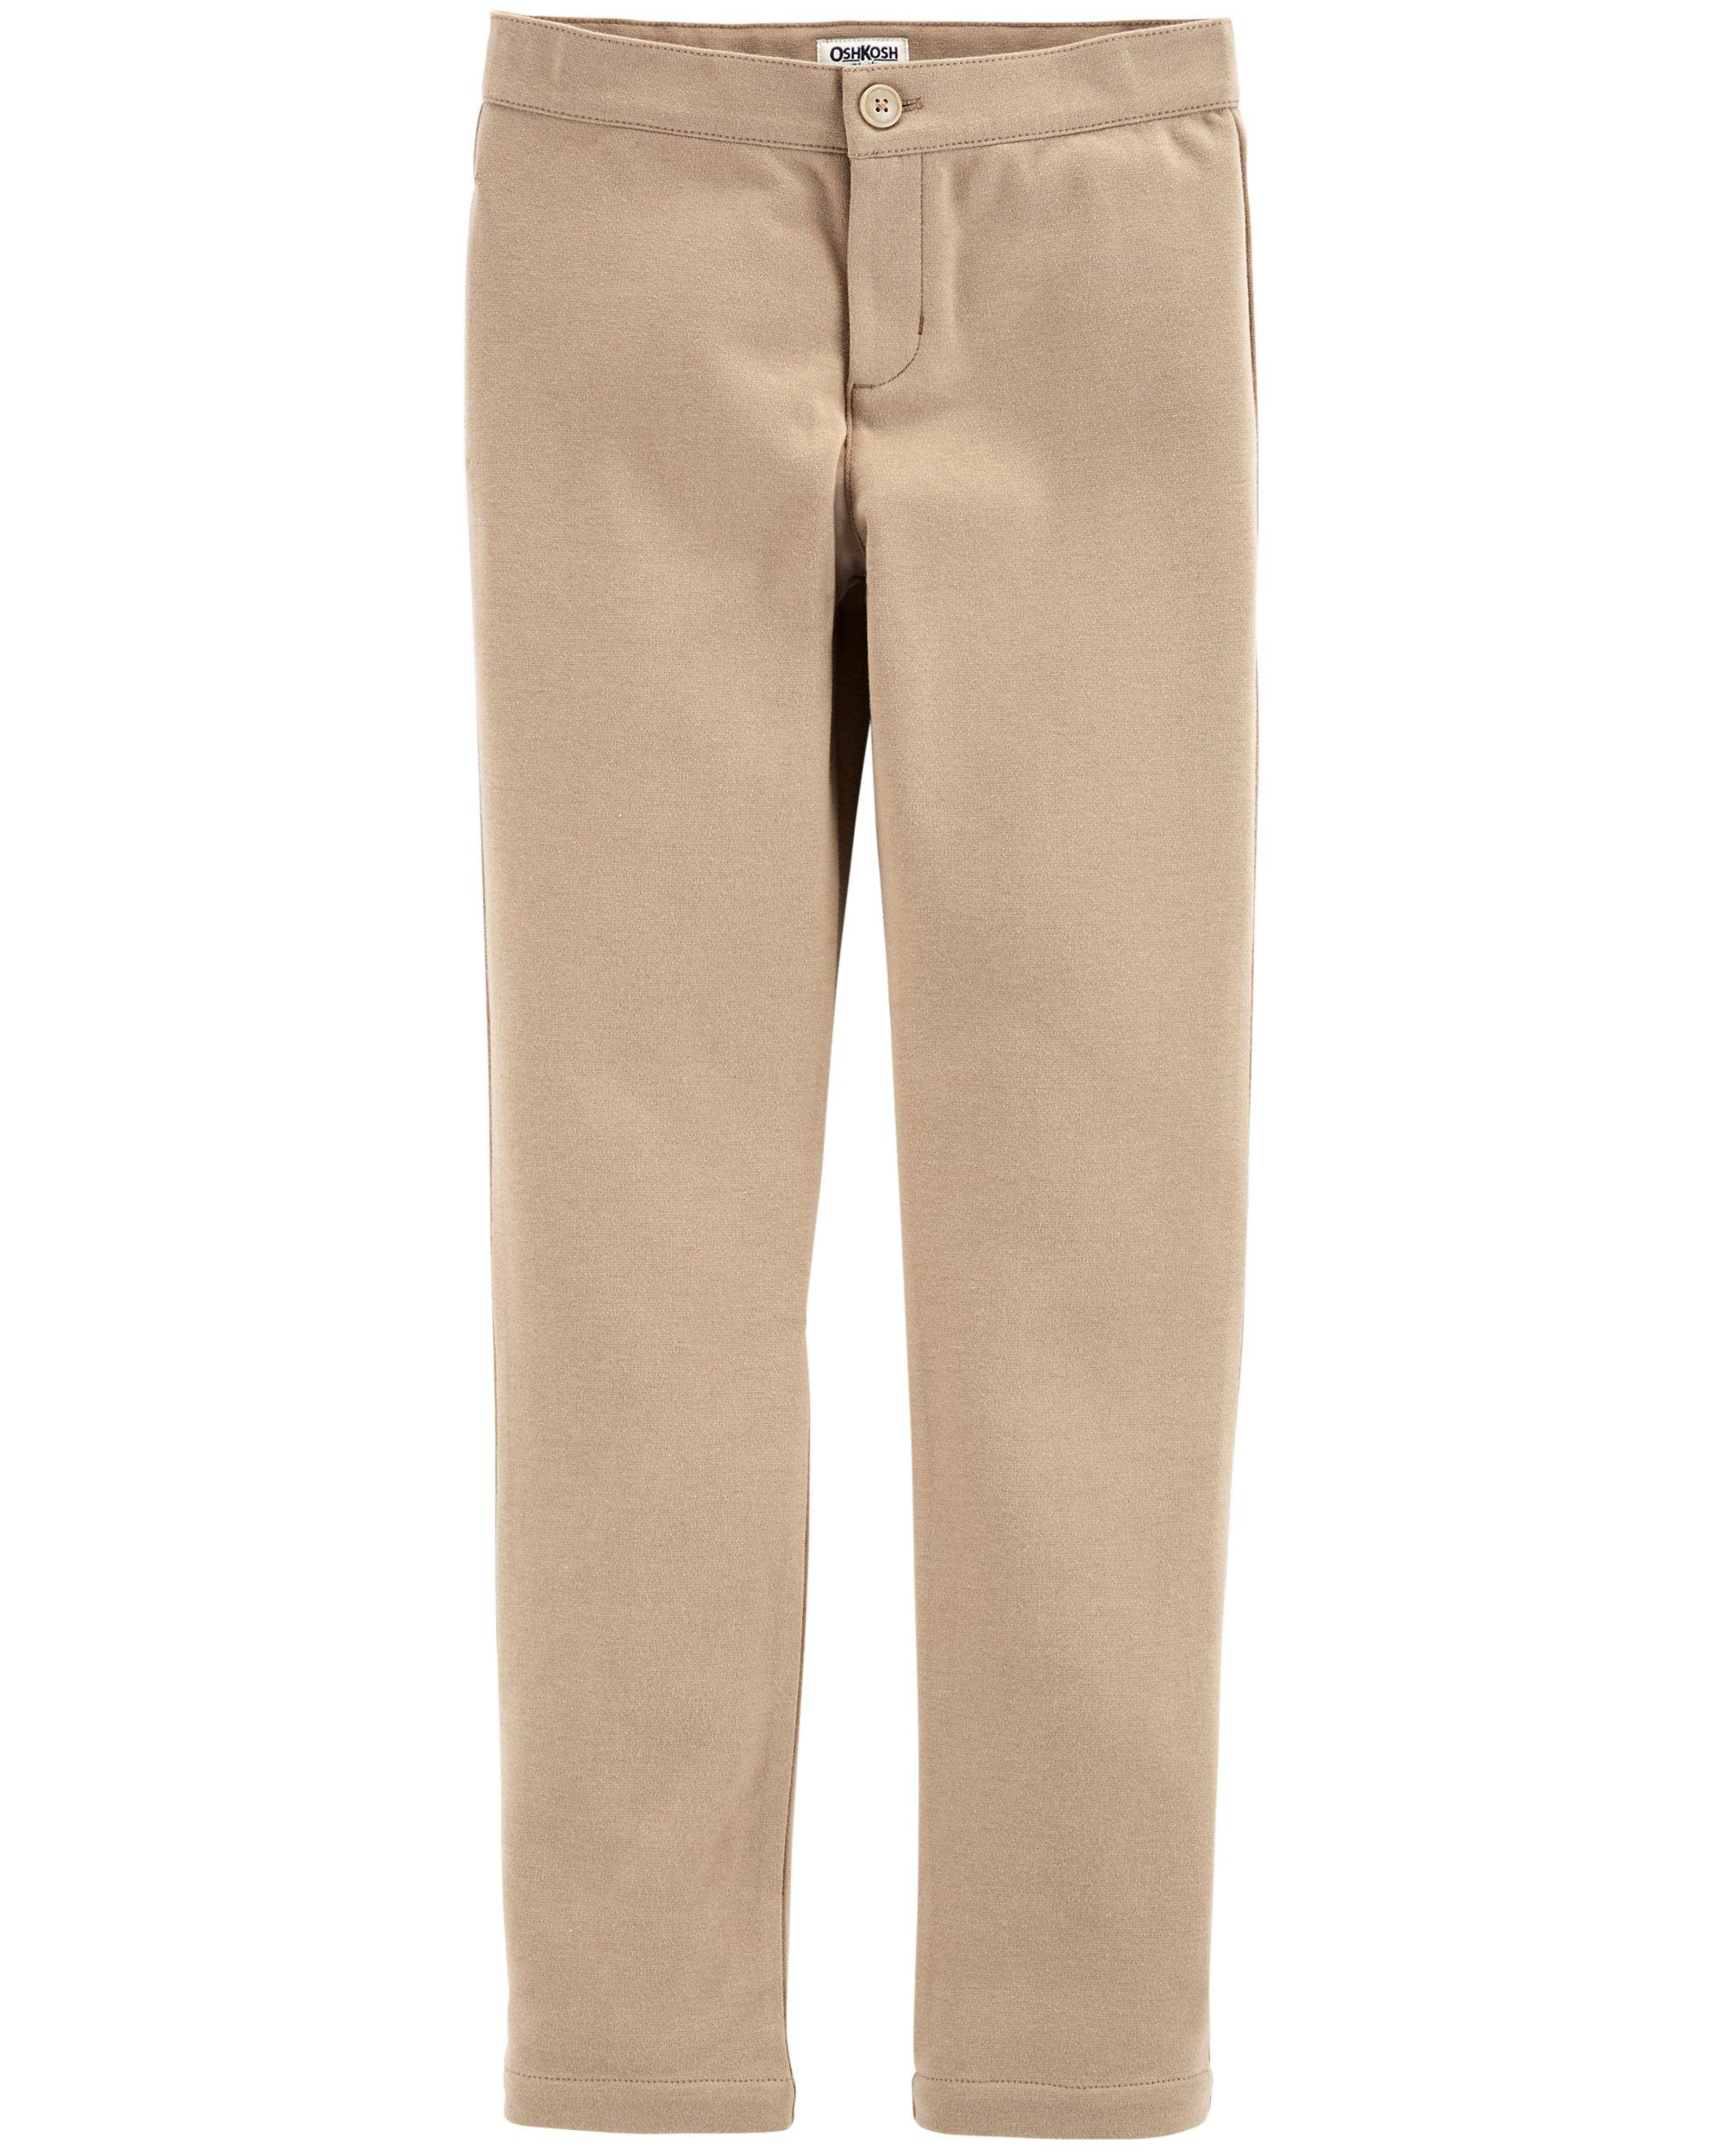 Osh Kosh Girls' Toddler Uniform Ponte Pant, Khaki, 4T